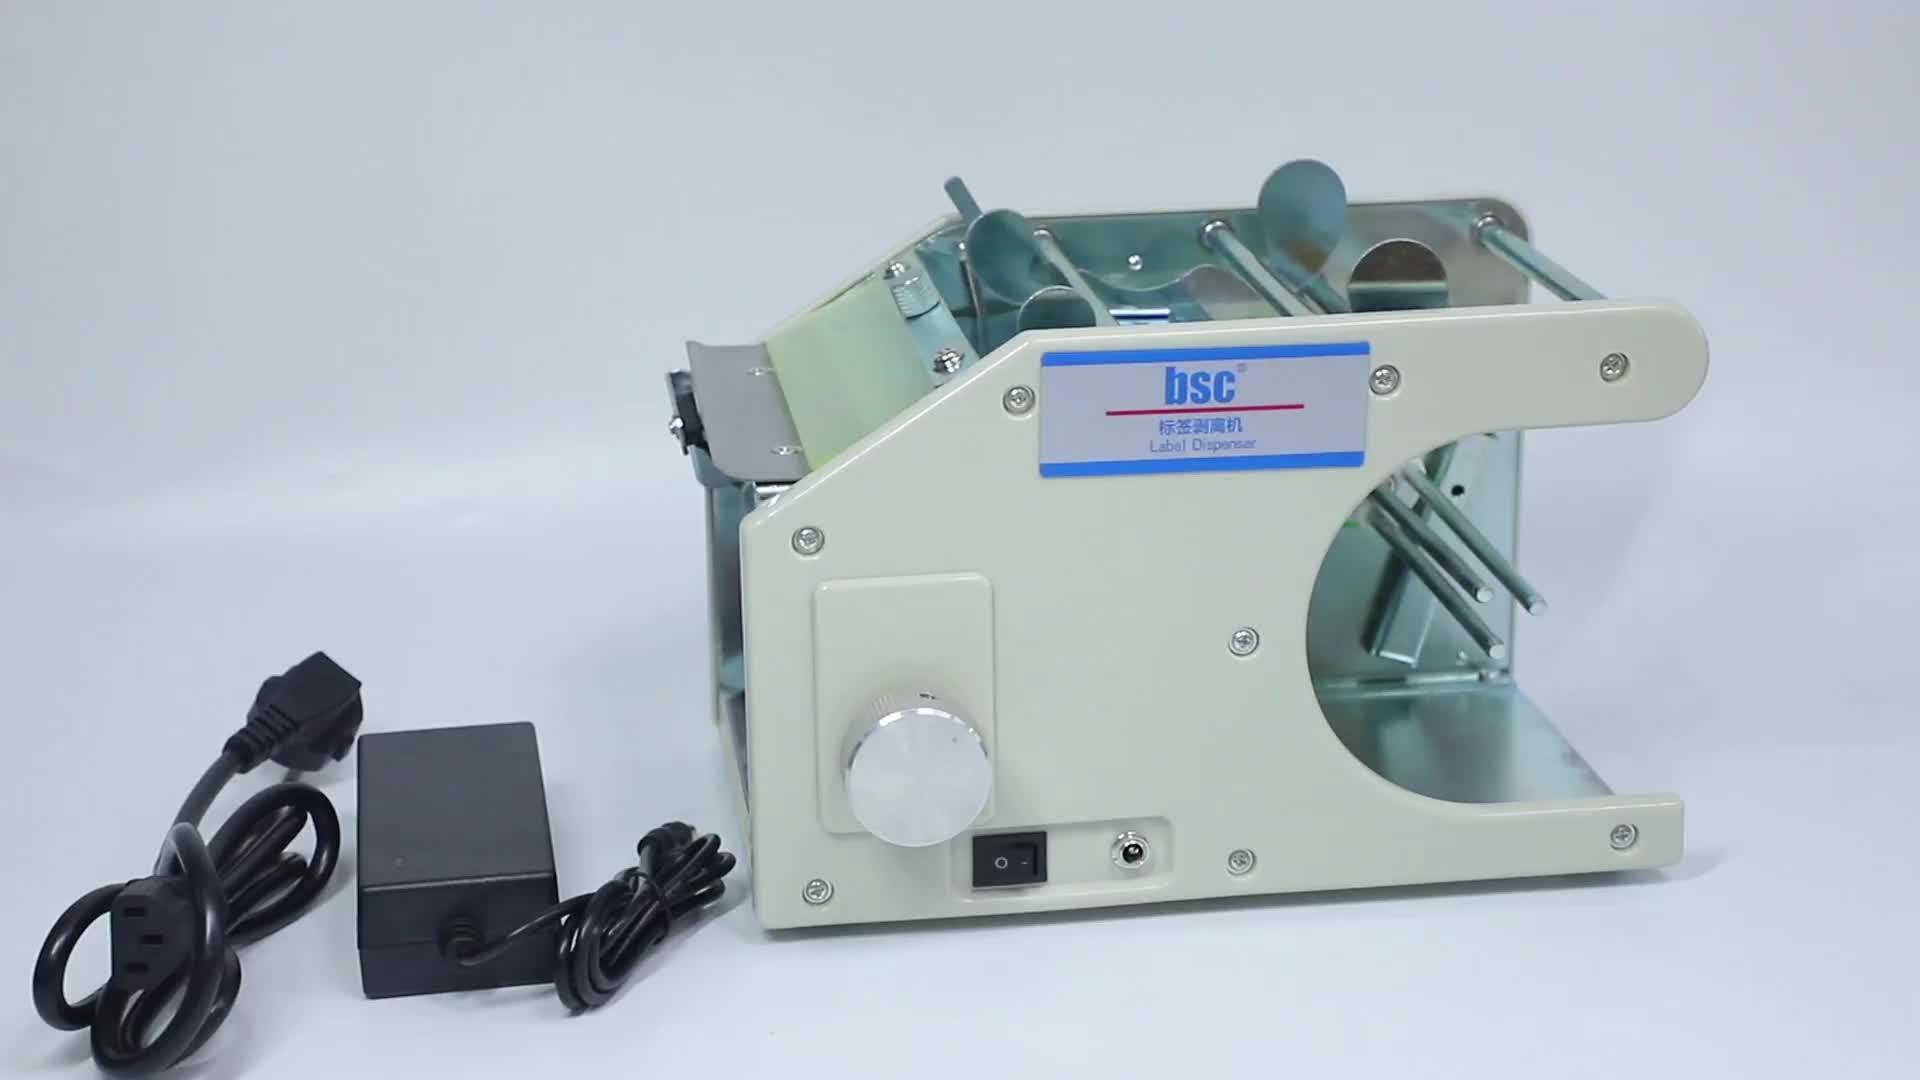 Hot Venda Automática Rótulo Máquina de Descascamento Manual Dispensador Rótulo Q120